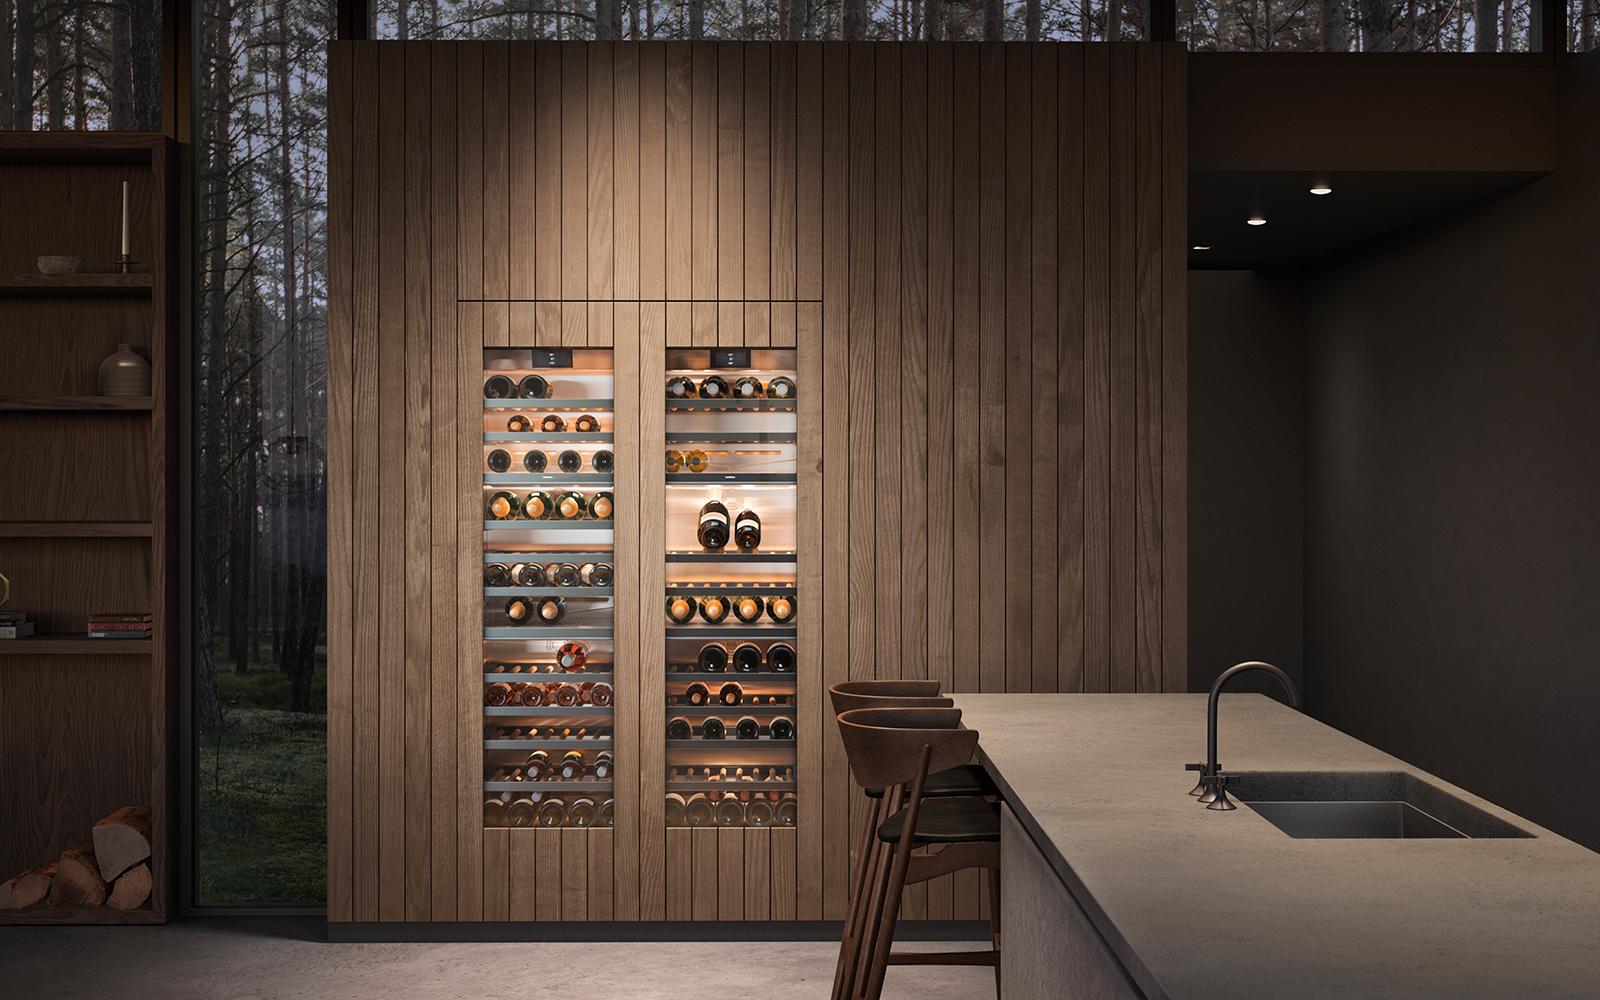 aswa keukens, the art of living, luxe keukenapparatuur